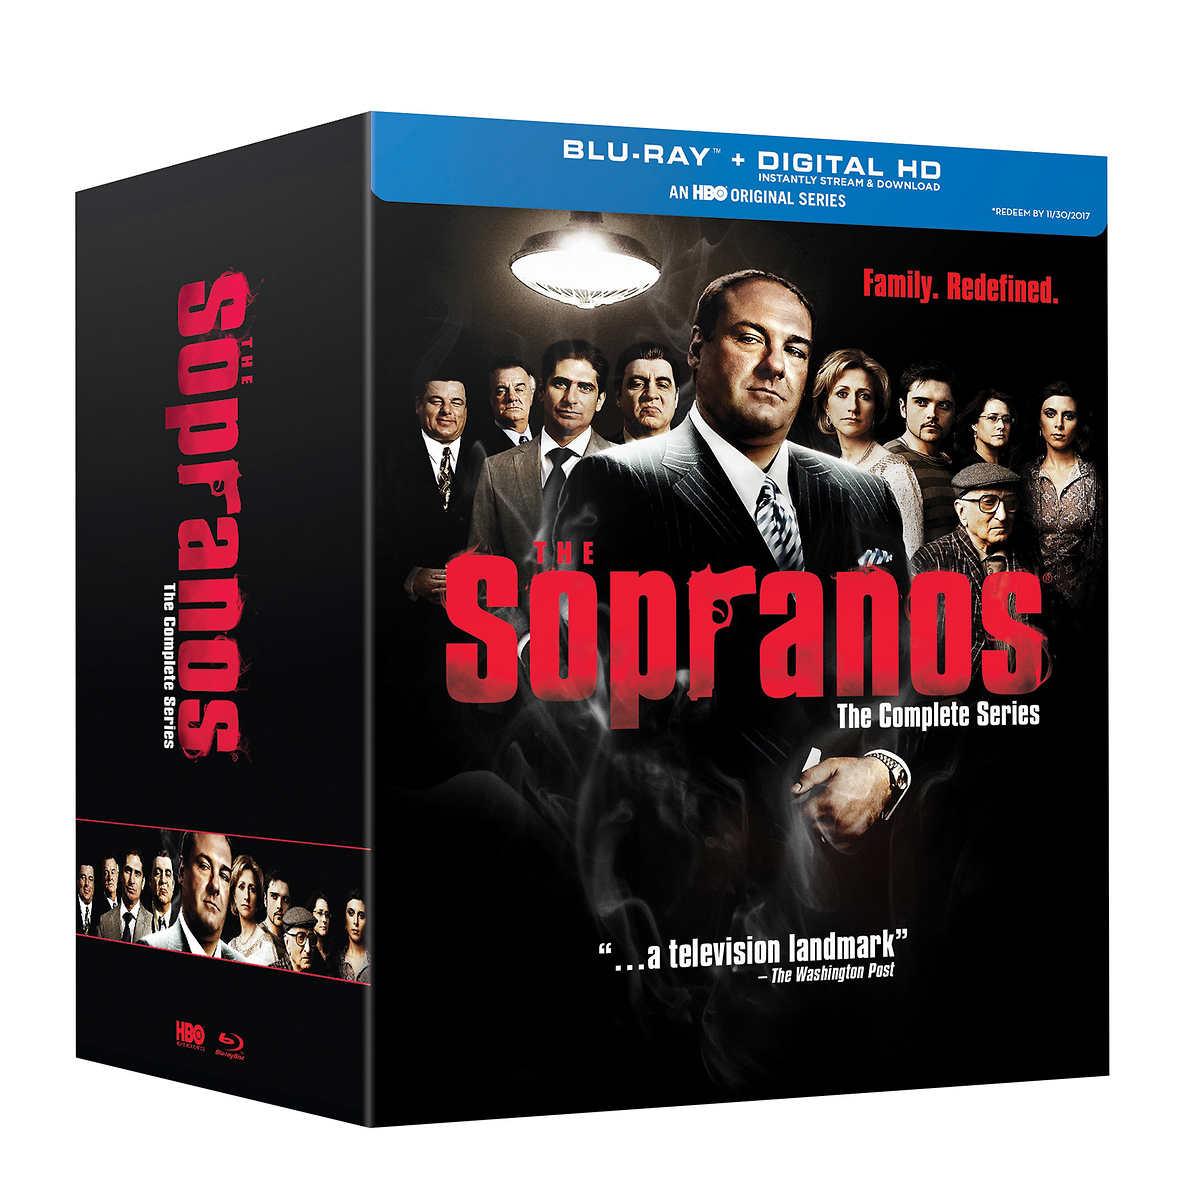 Sopranos the complete series blu ray set